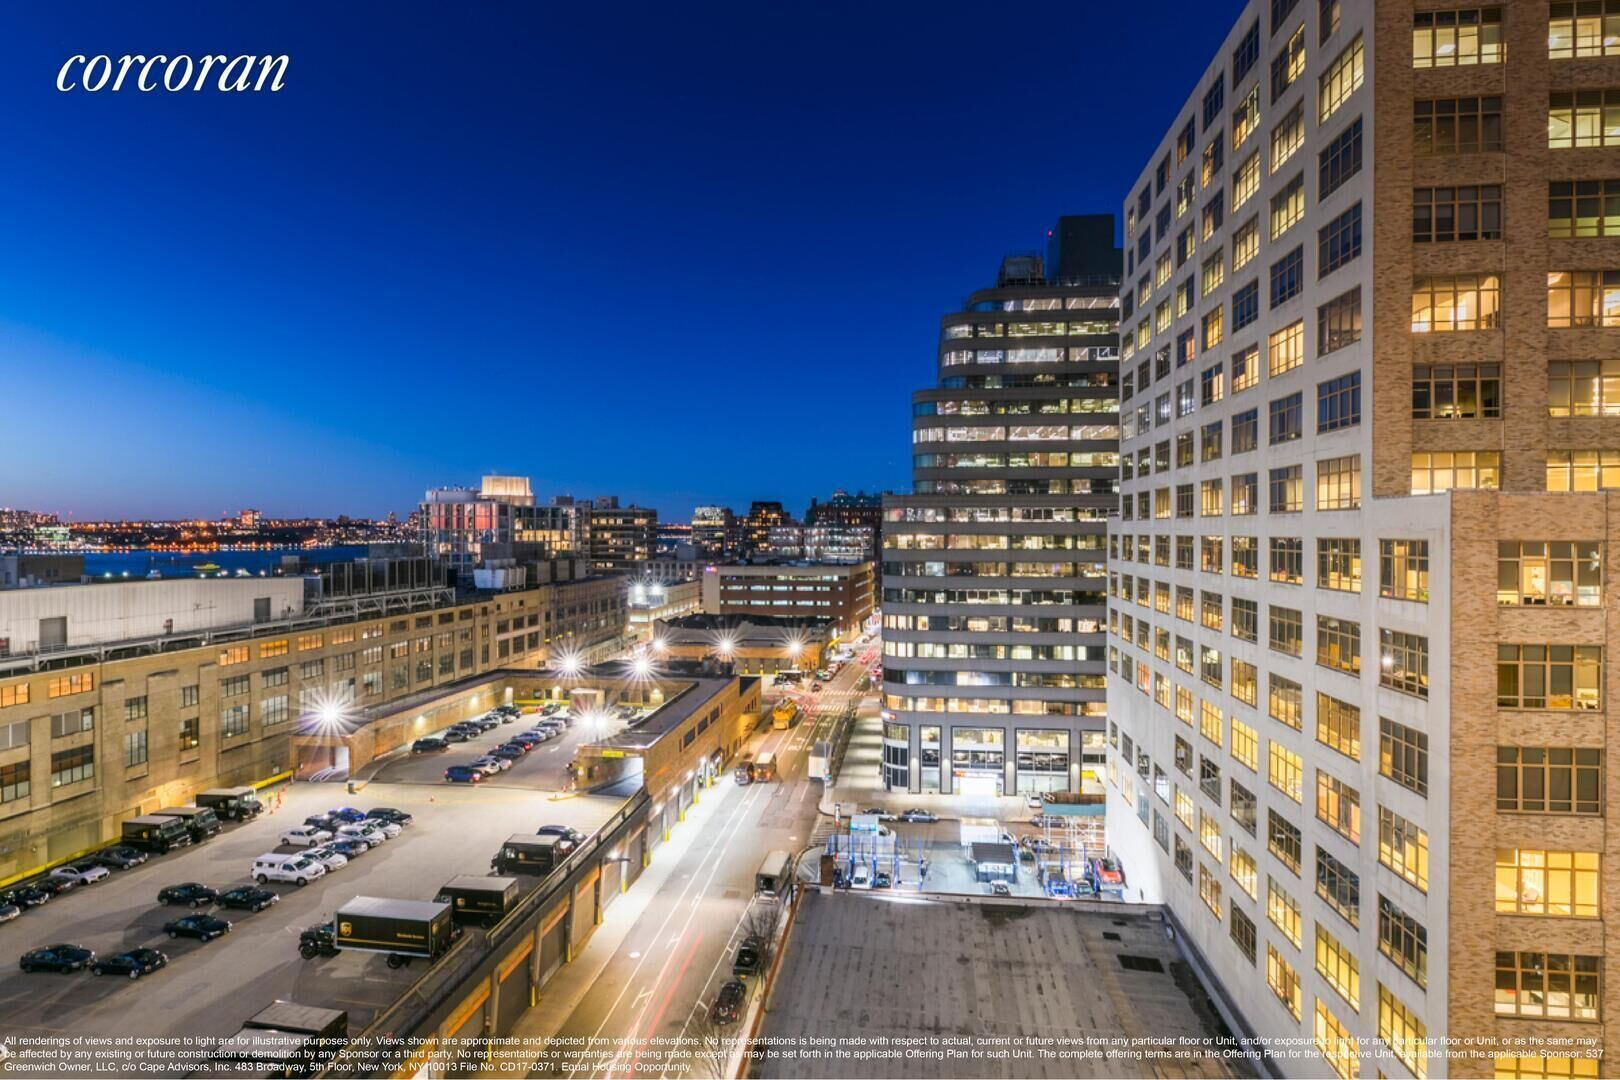 Apartment for sale at 110 Charlton Street, Apt 15D